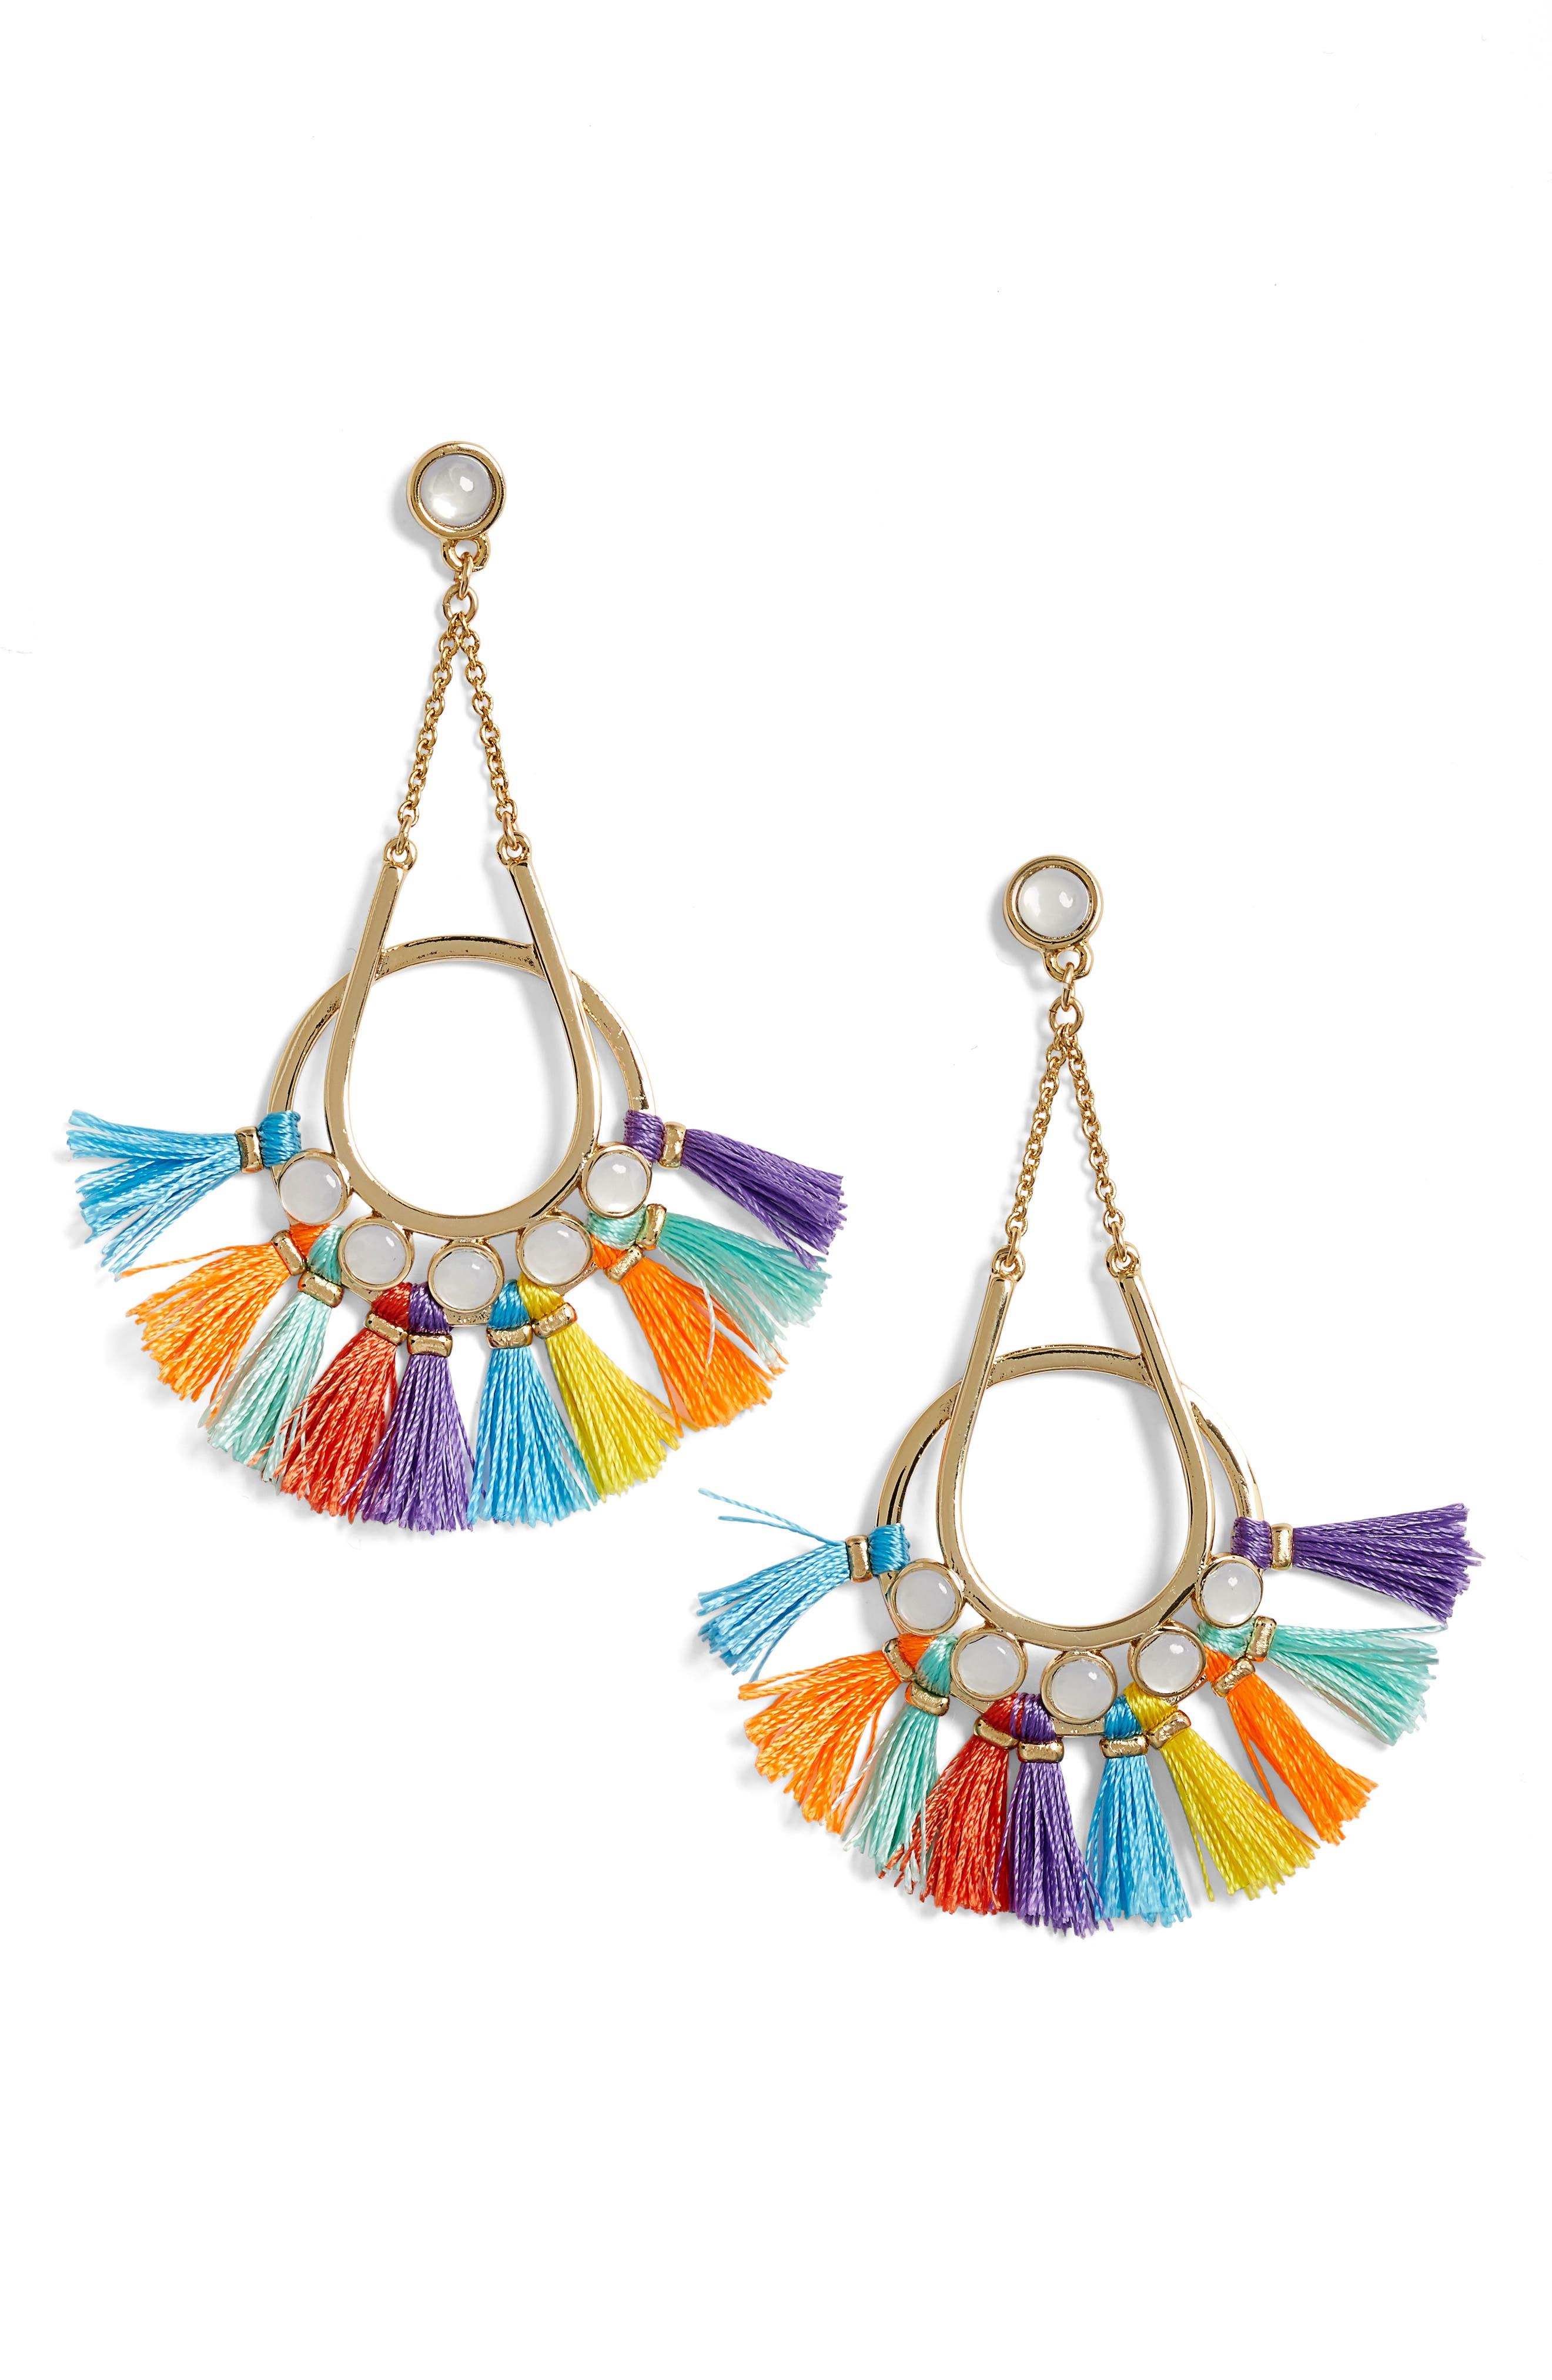 Alternate Image 1 Selected - Rebecca Minkoff Utopia Tassel Chandelier Earrings